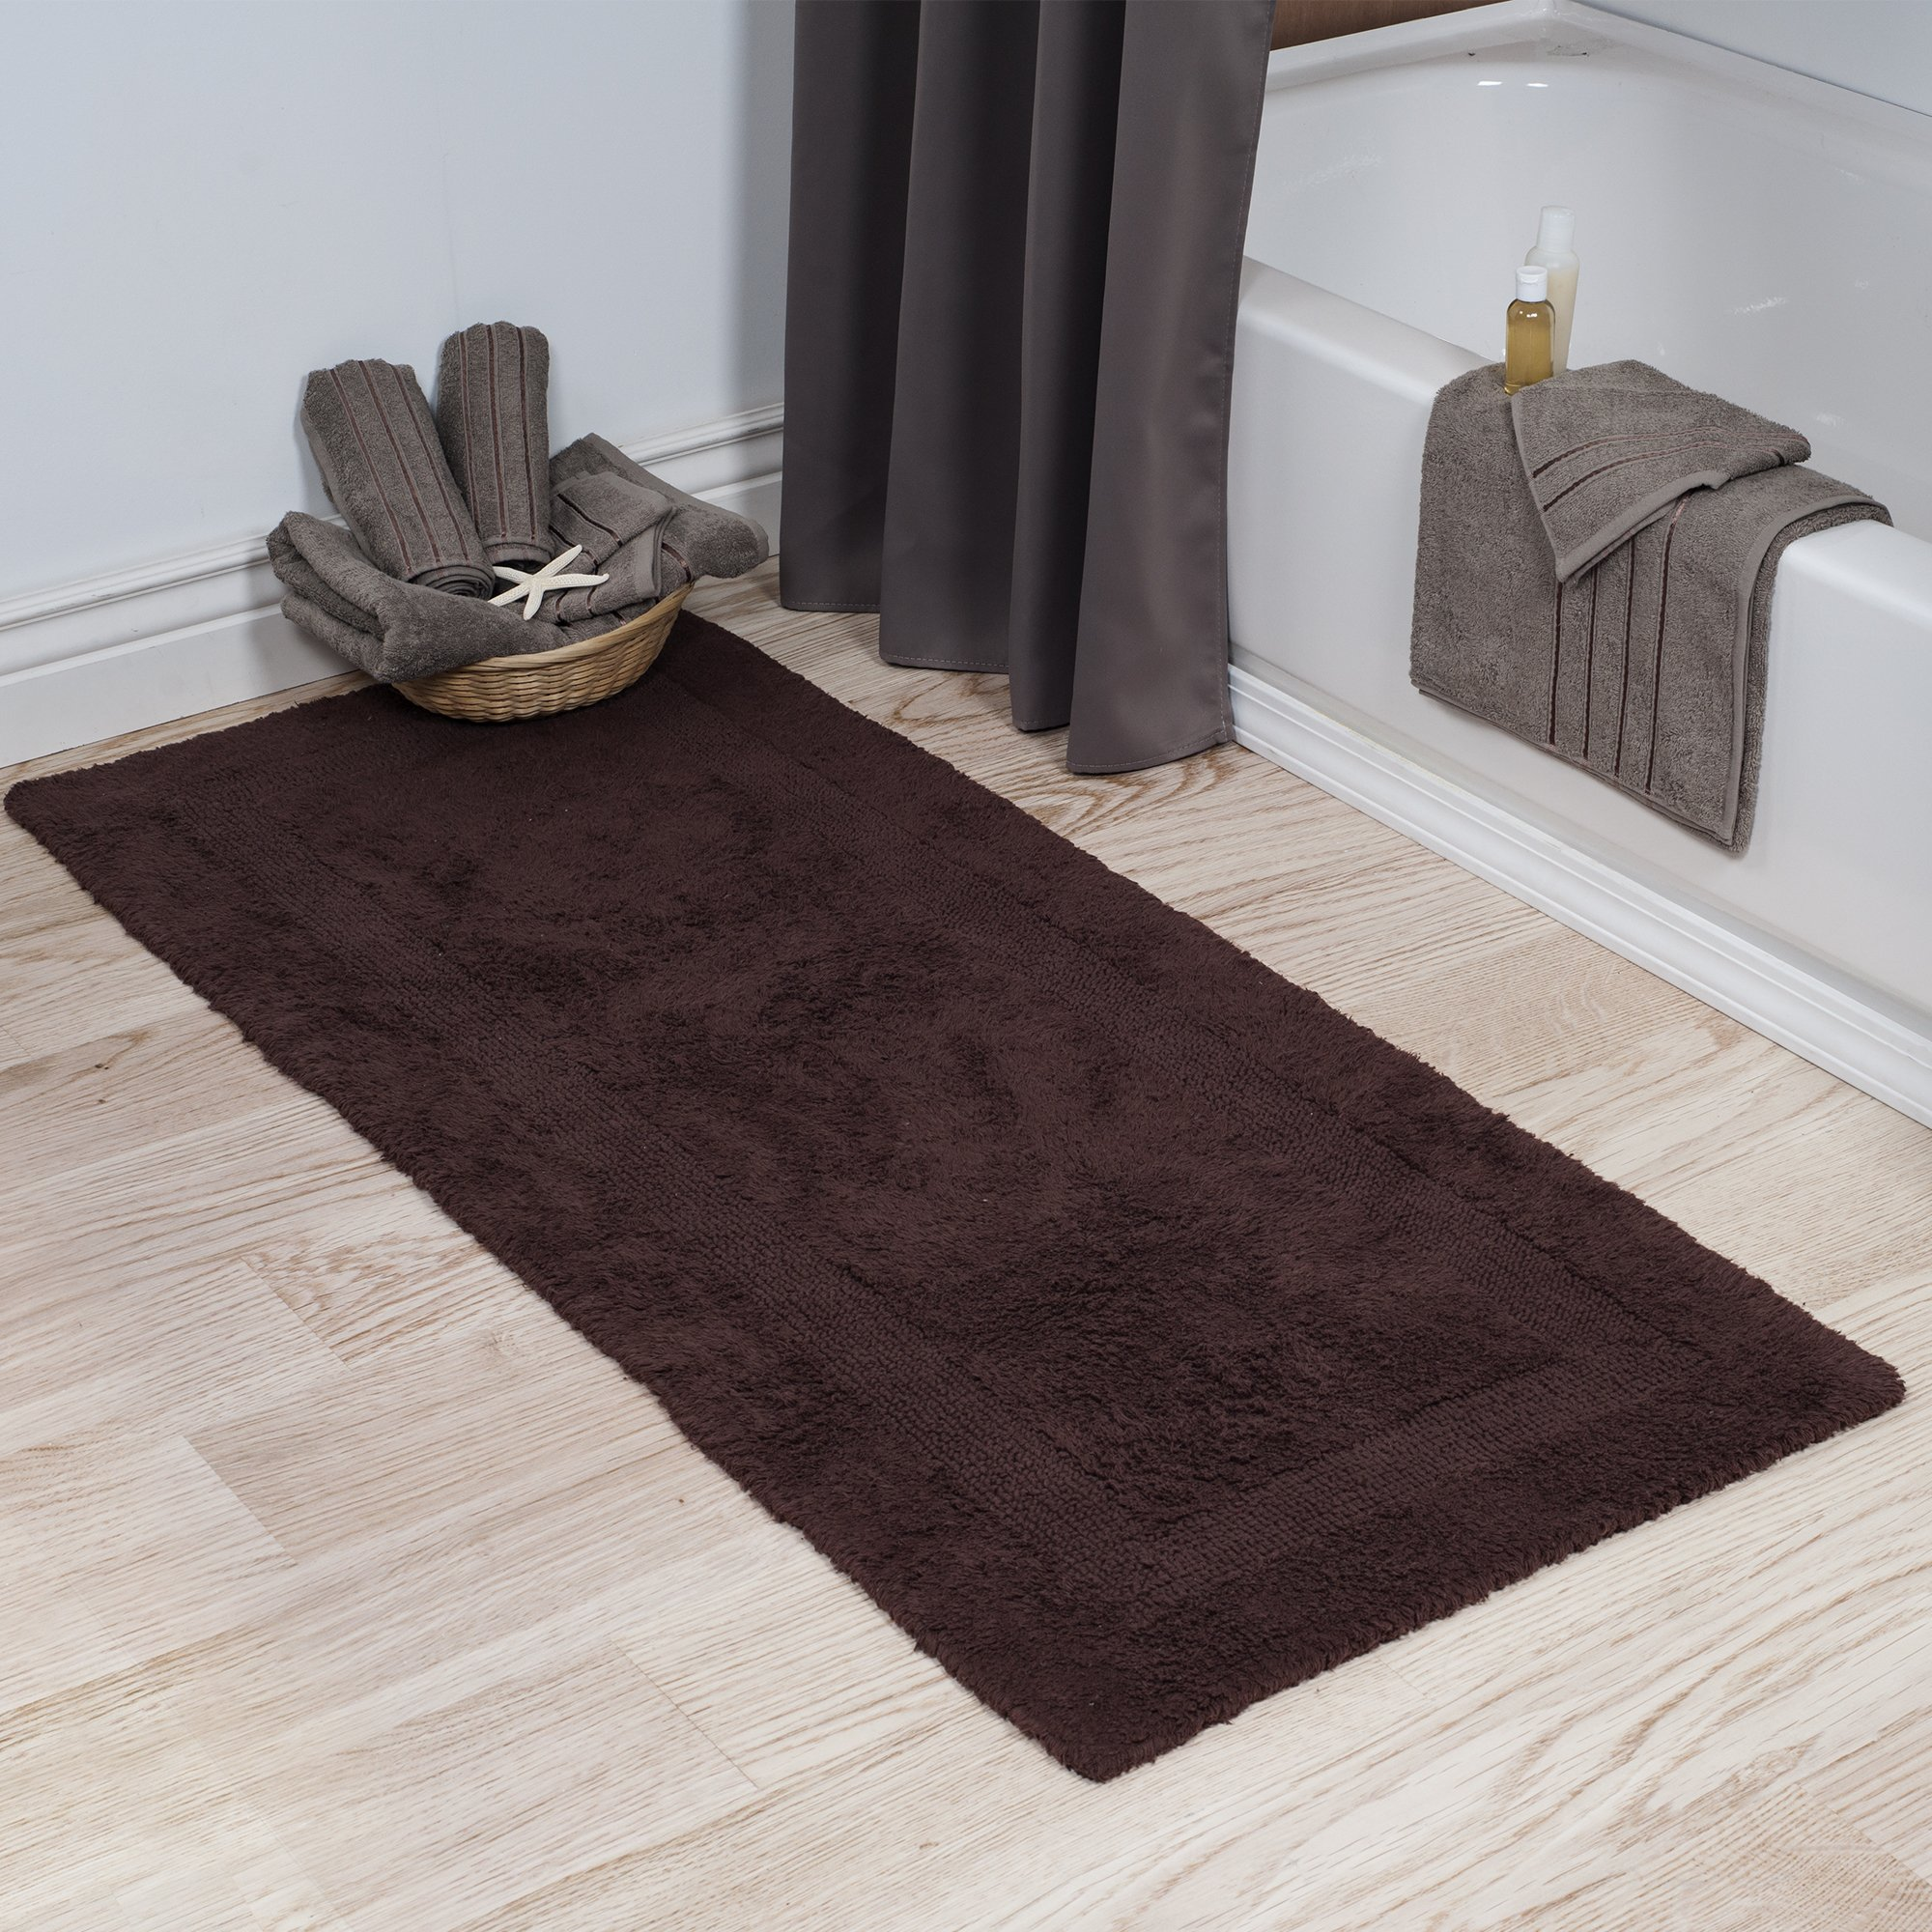 Bedford Home 100% Cotton Reversible Long Bath Rug - Chocolate - 24x60